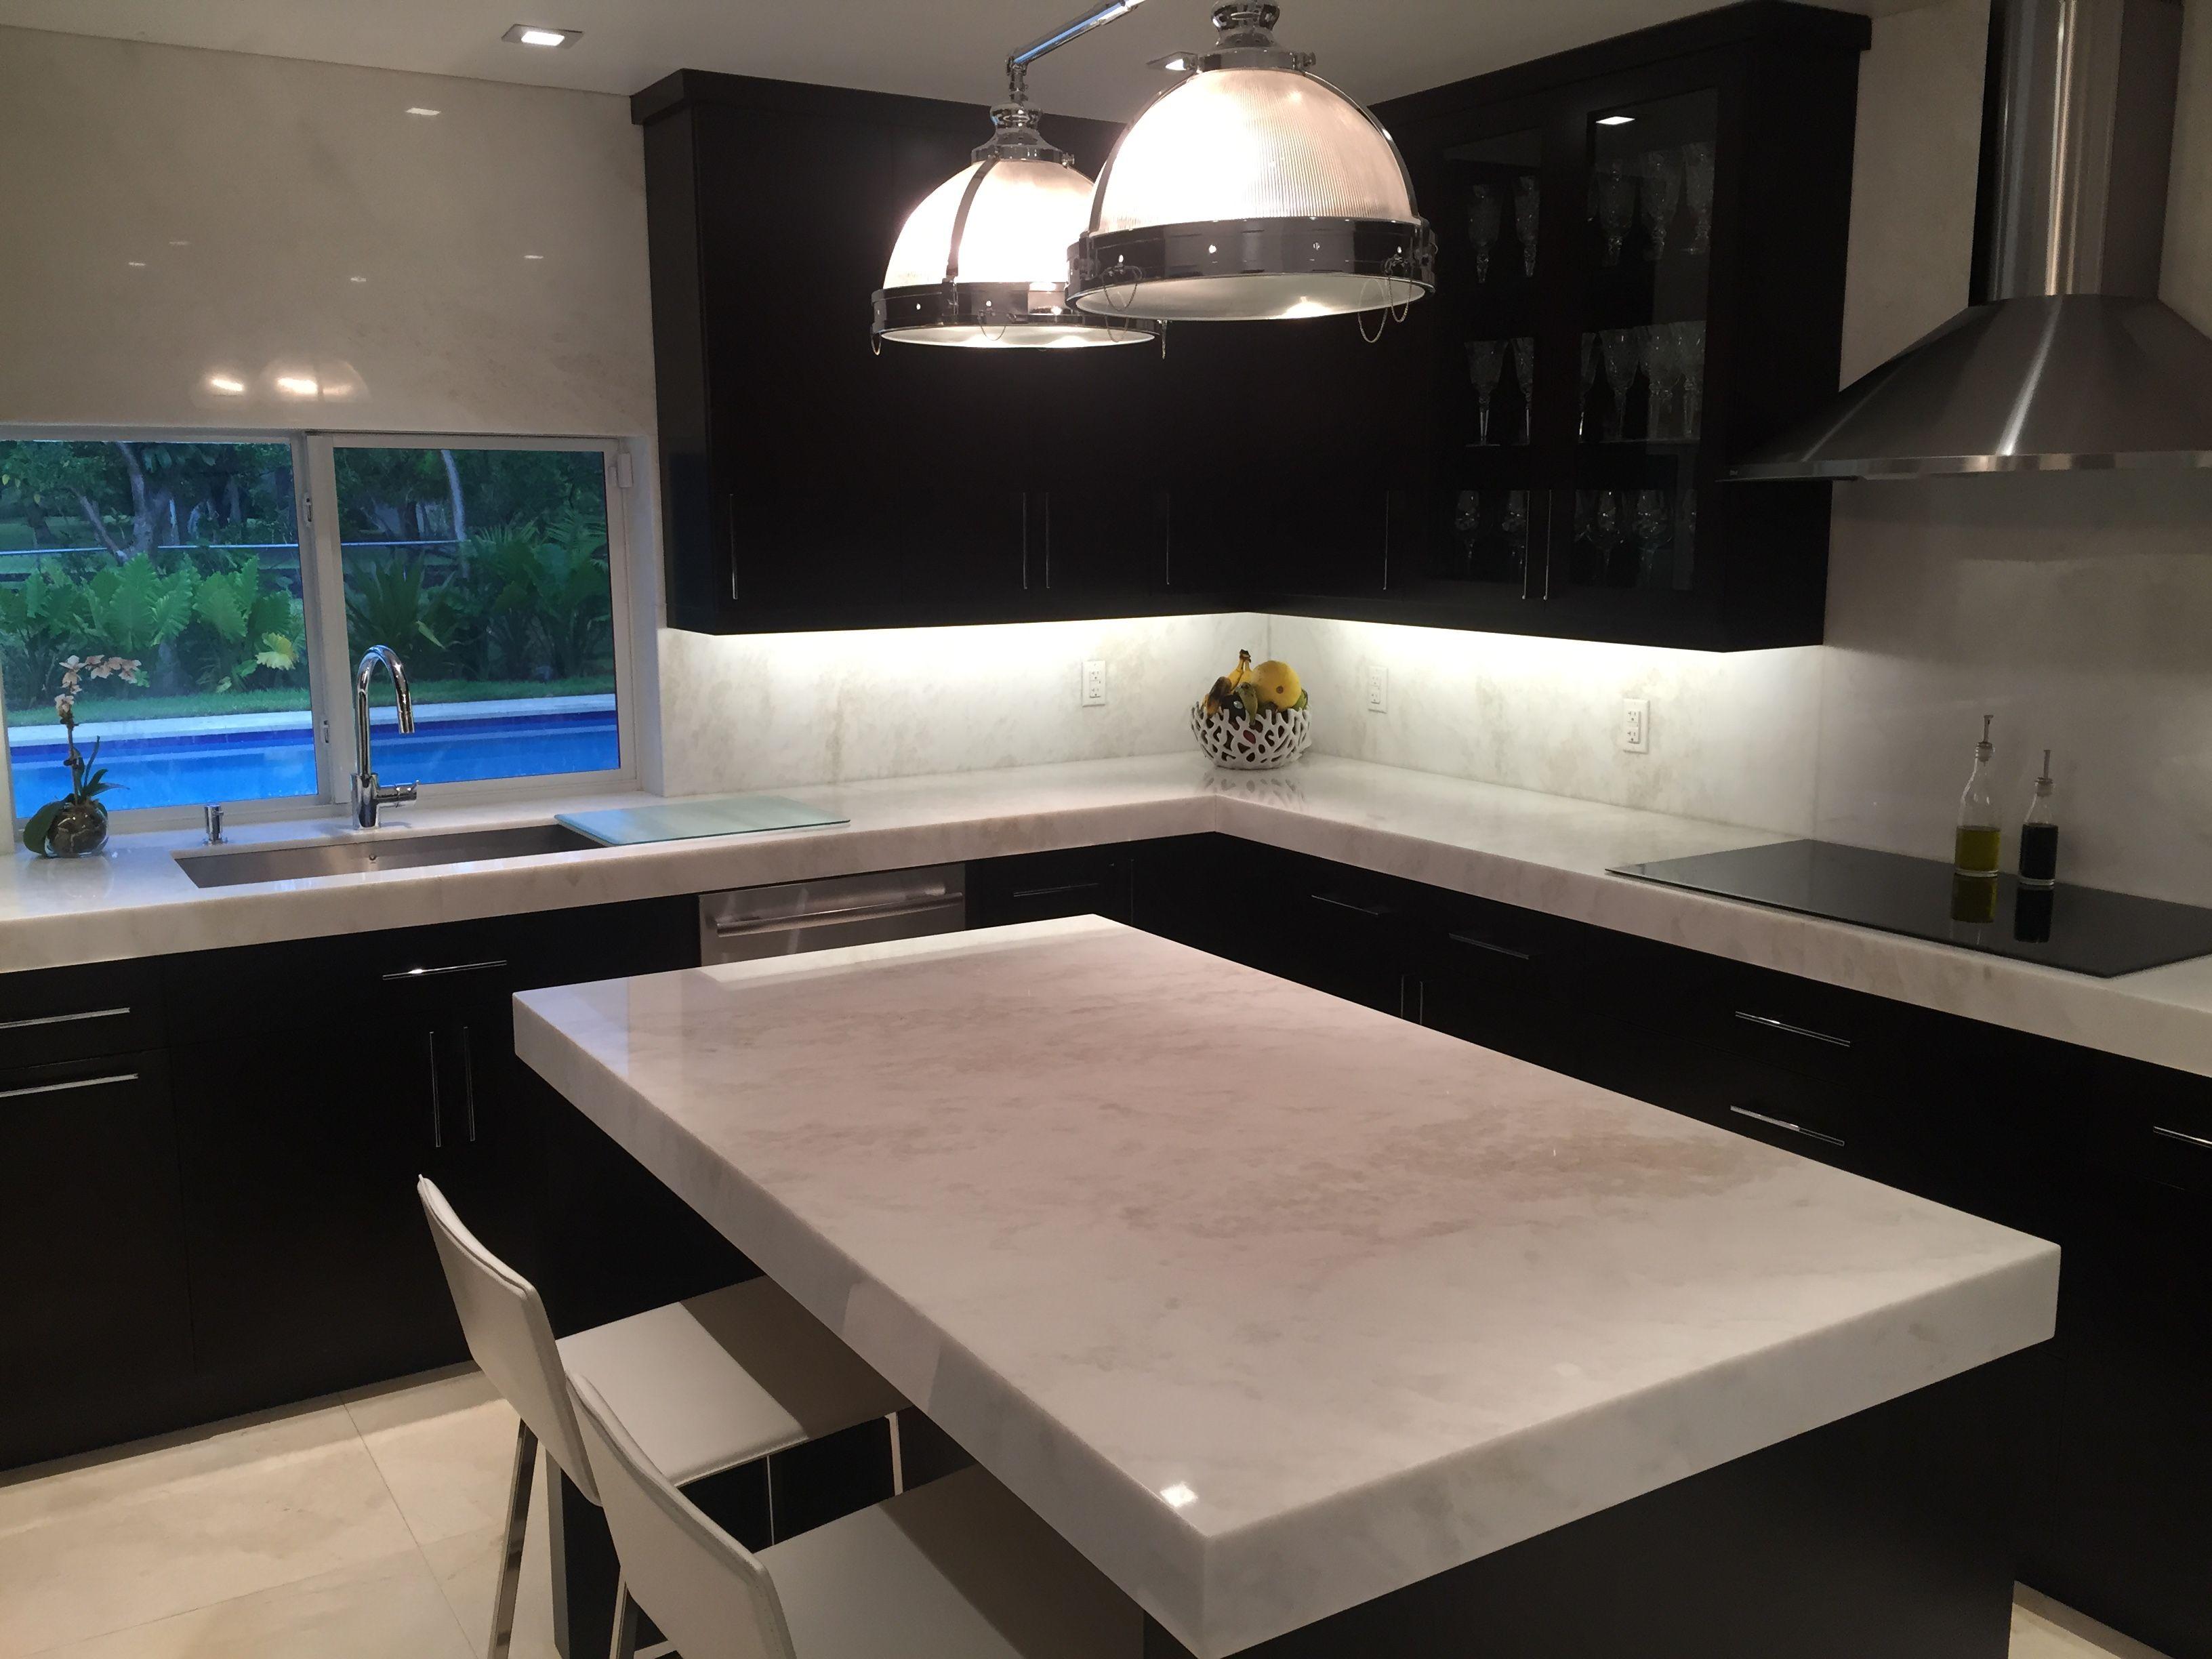 Mystery White Marble Slab Kitchen Countertop South Miami